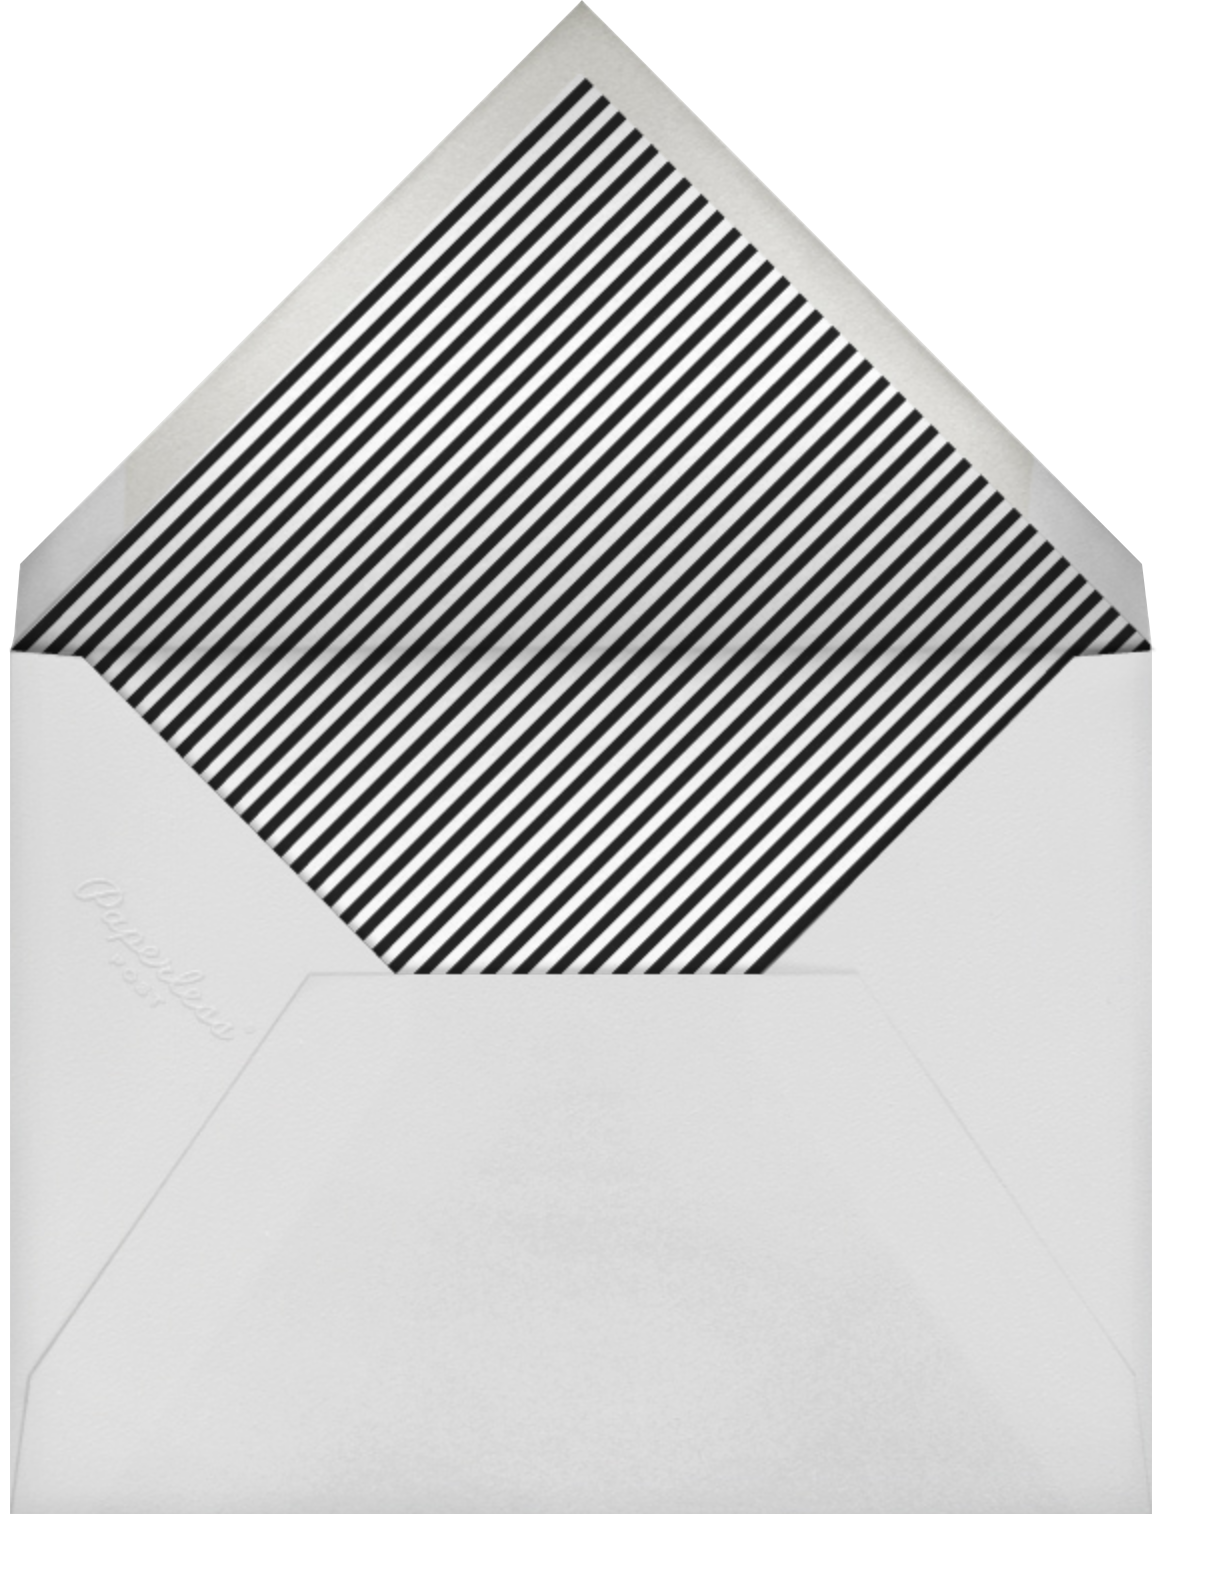 Mini Berlin - Brights - Mr. Boddington's Studio - Adult birthday - envelope back